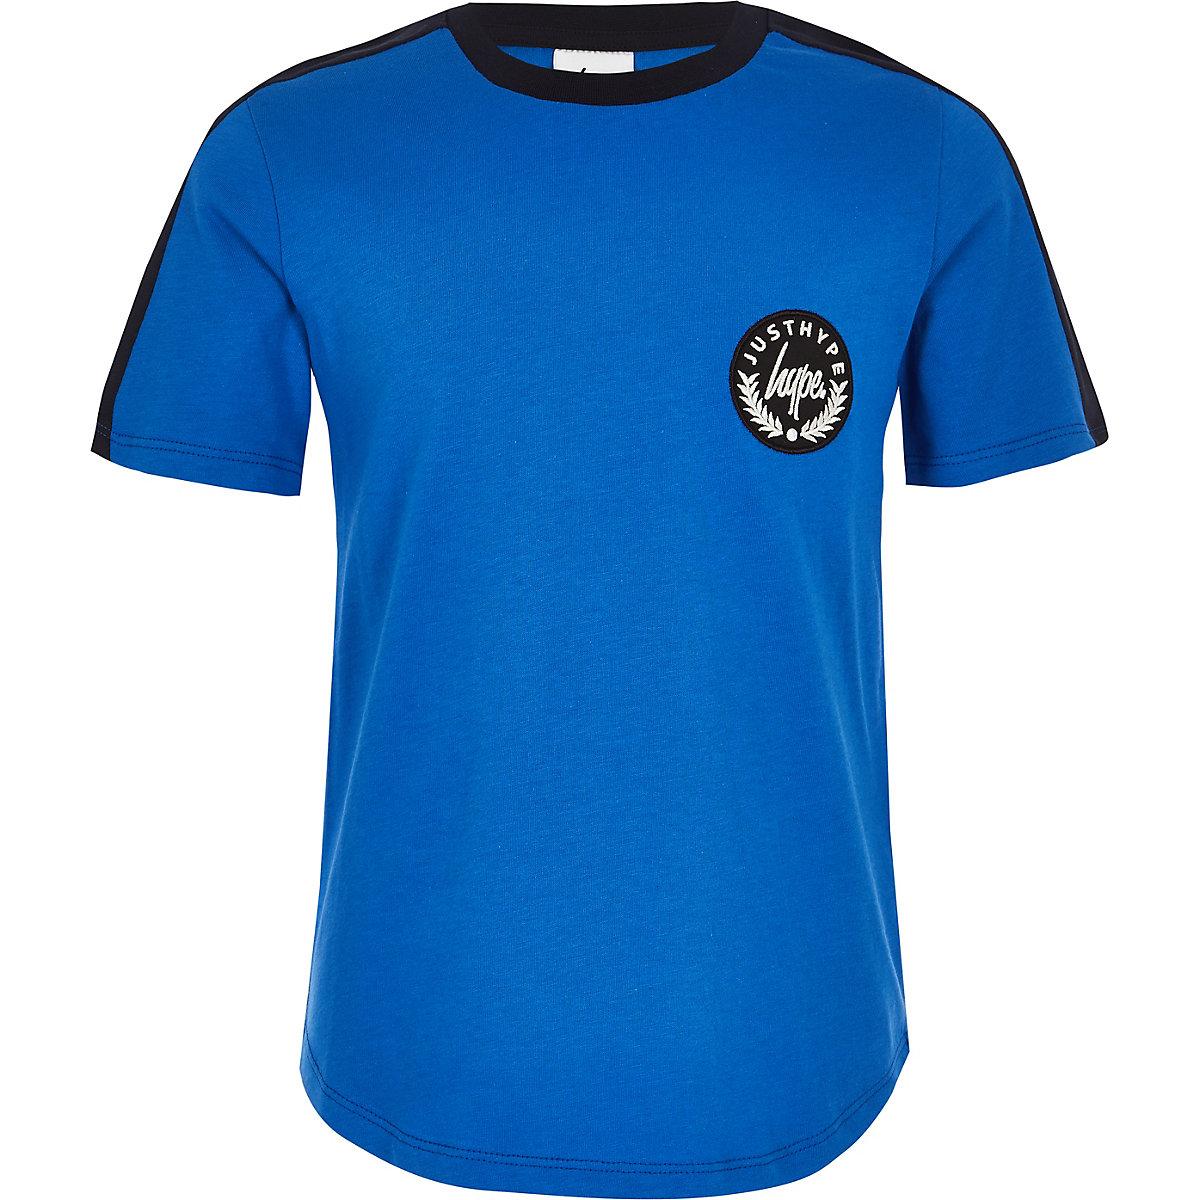 Boys Hype blue tape T-shirt